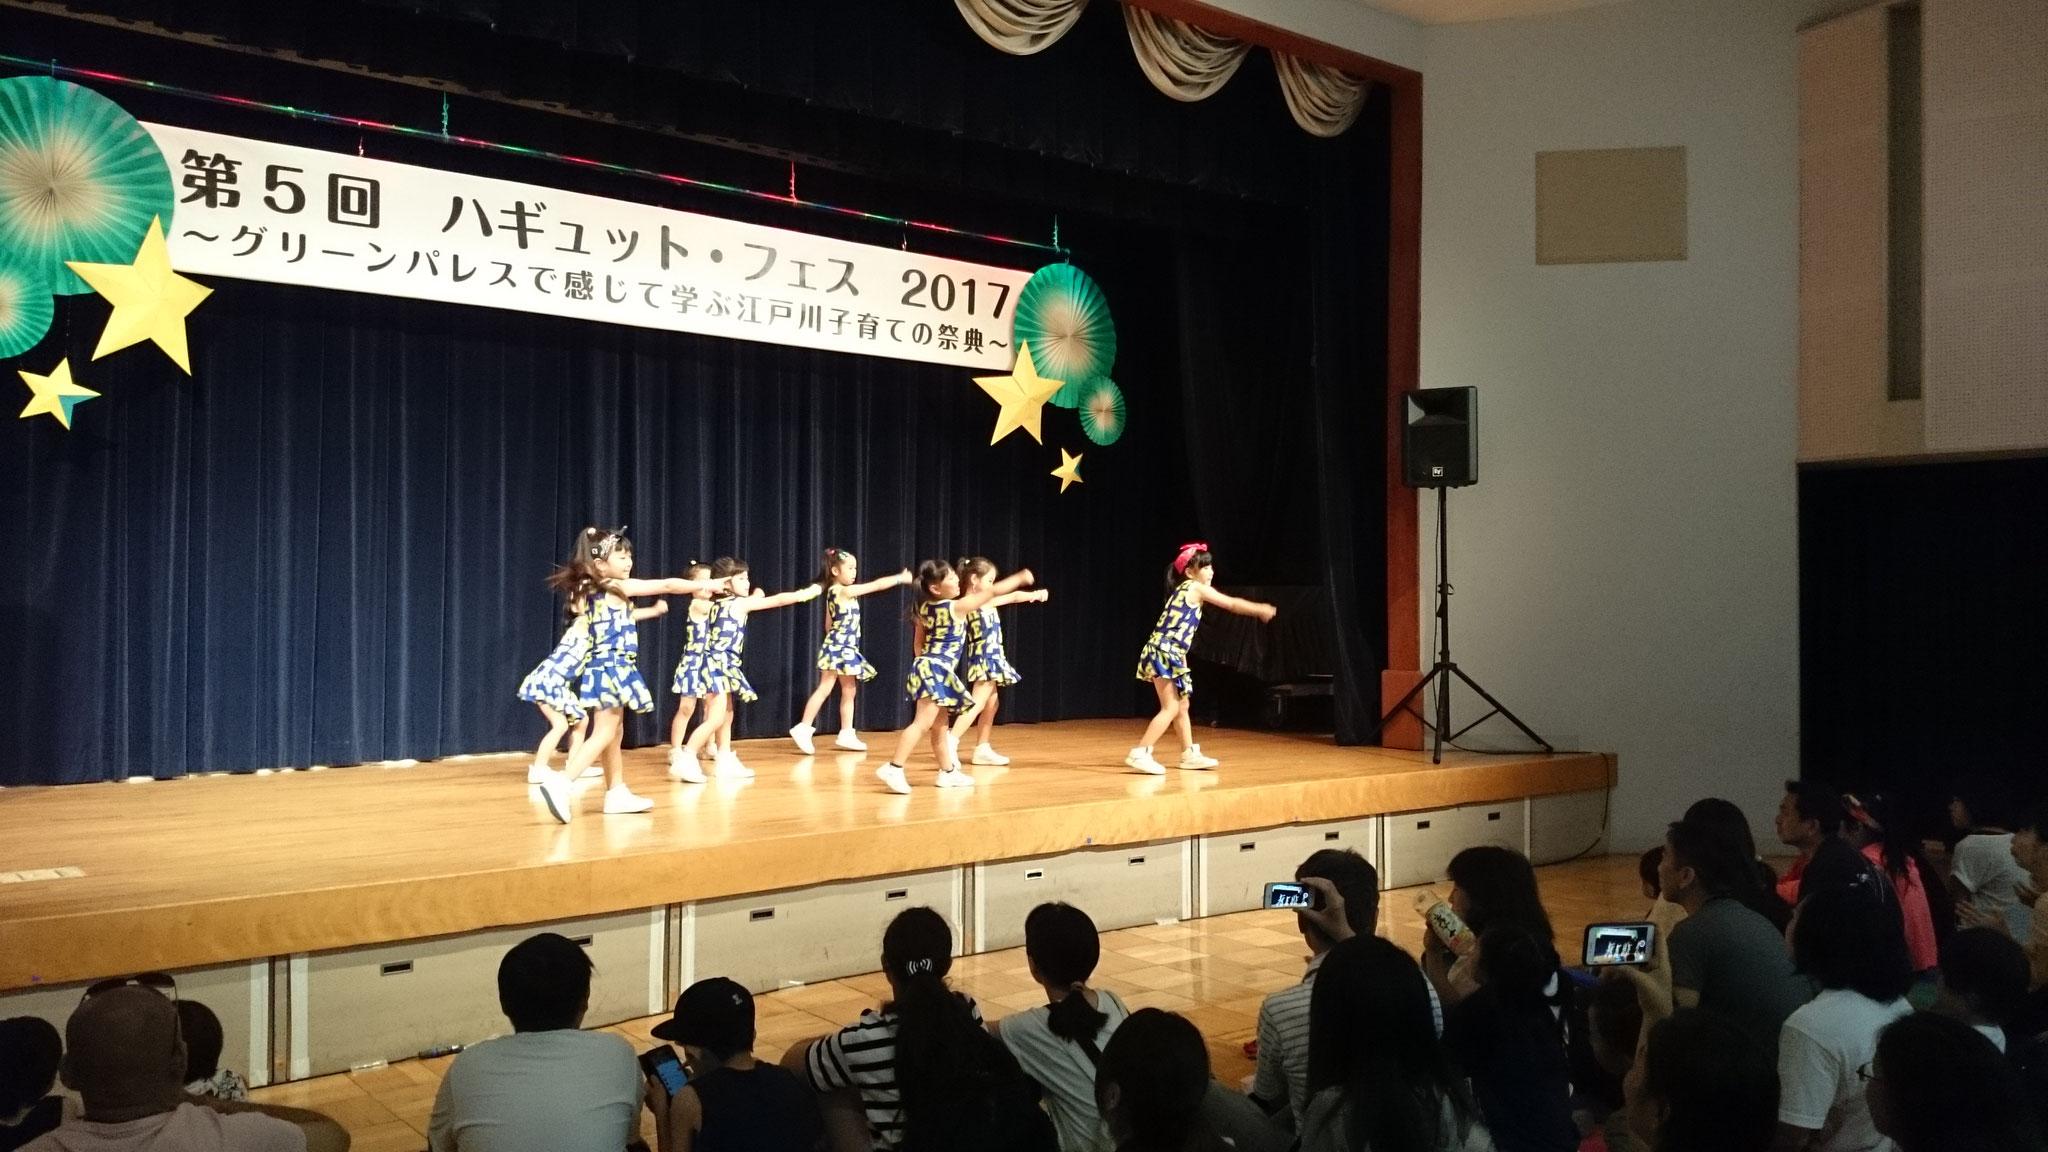 DCK☆2度目のステージでもしっかり笑顔で全力でした!